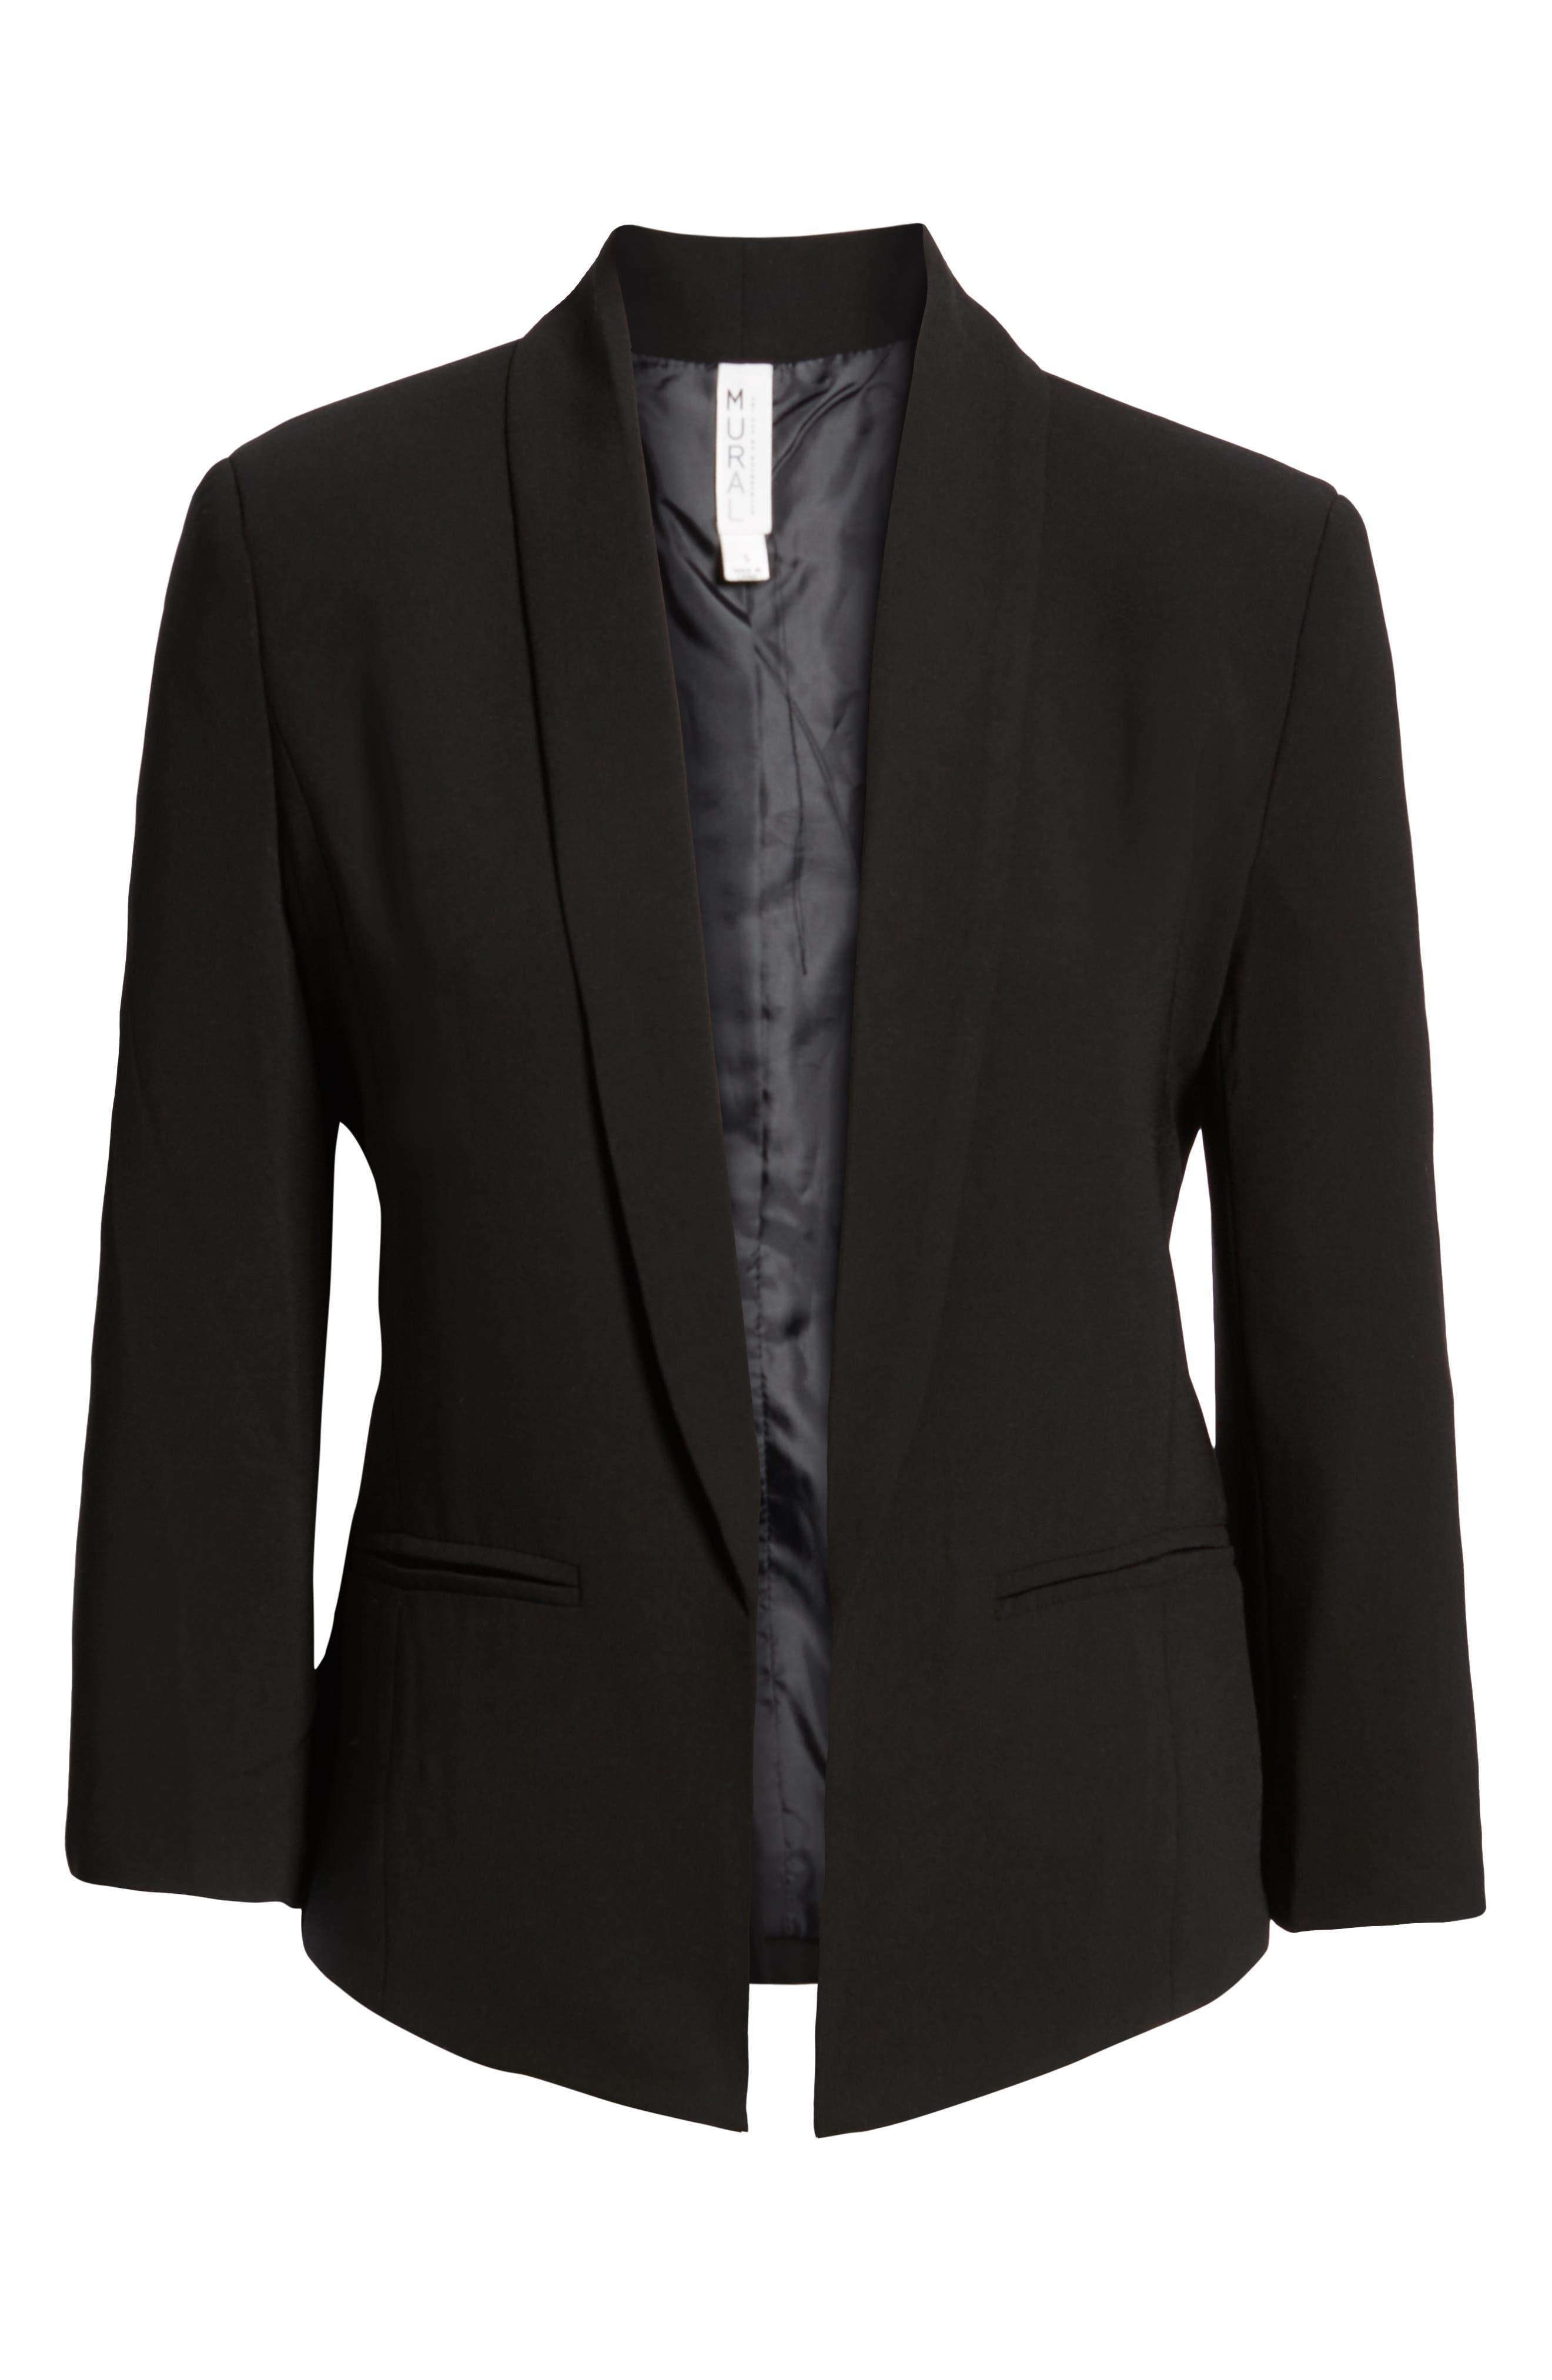 MURAL 'Curve' Open Front Shawl Collar Blazer, Main, color, BLACK